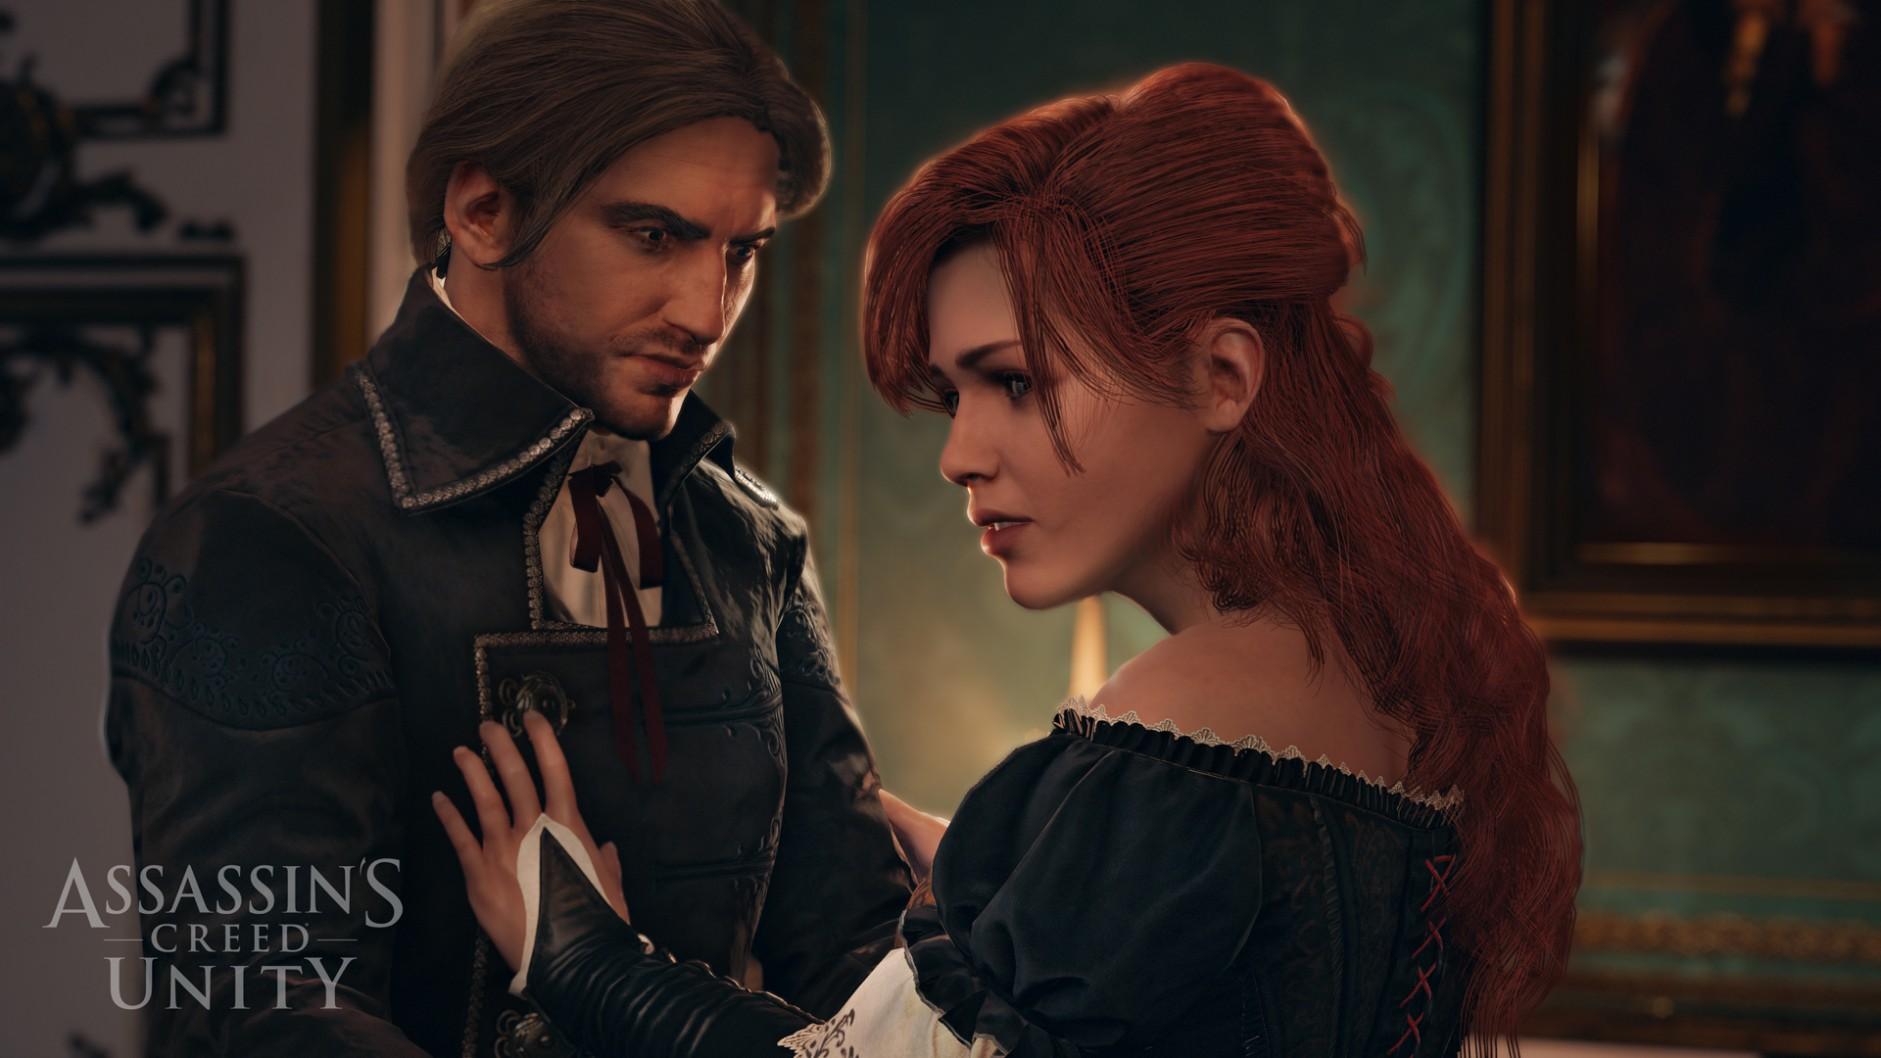 Assassin-Creed-Unity-Free-Setup-Download